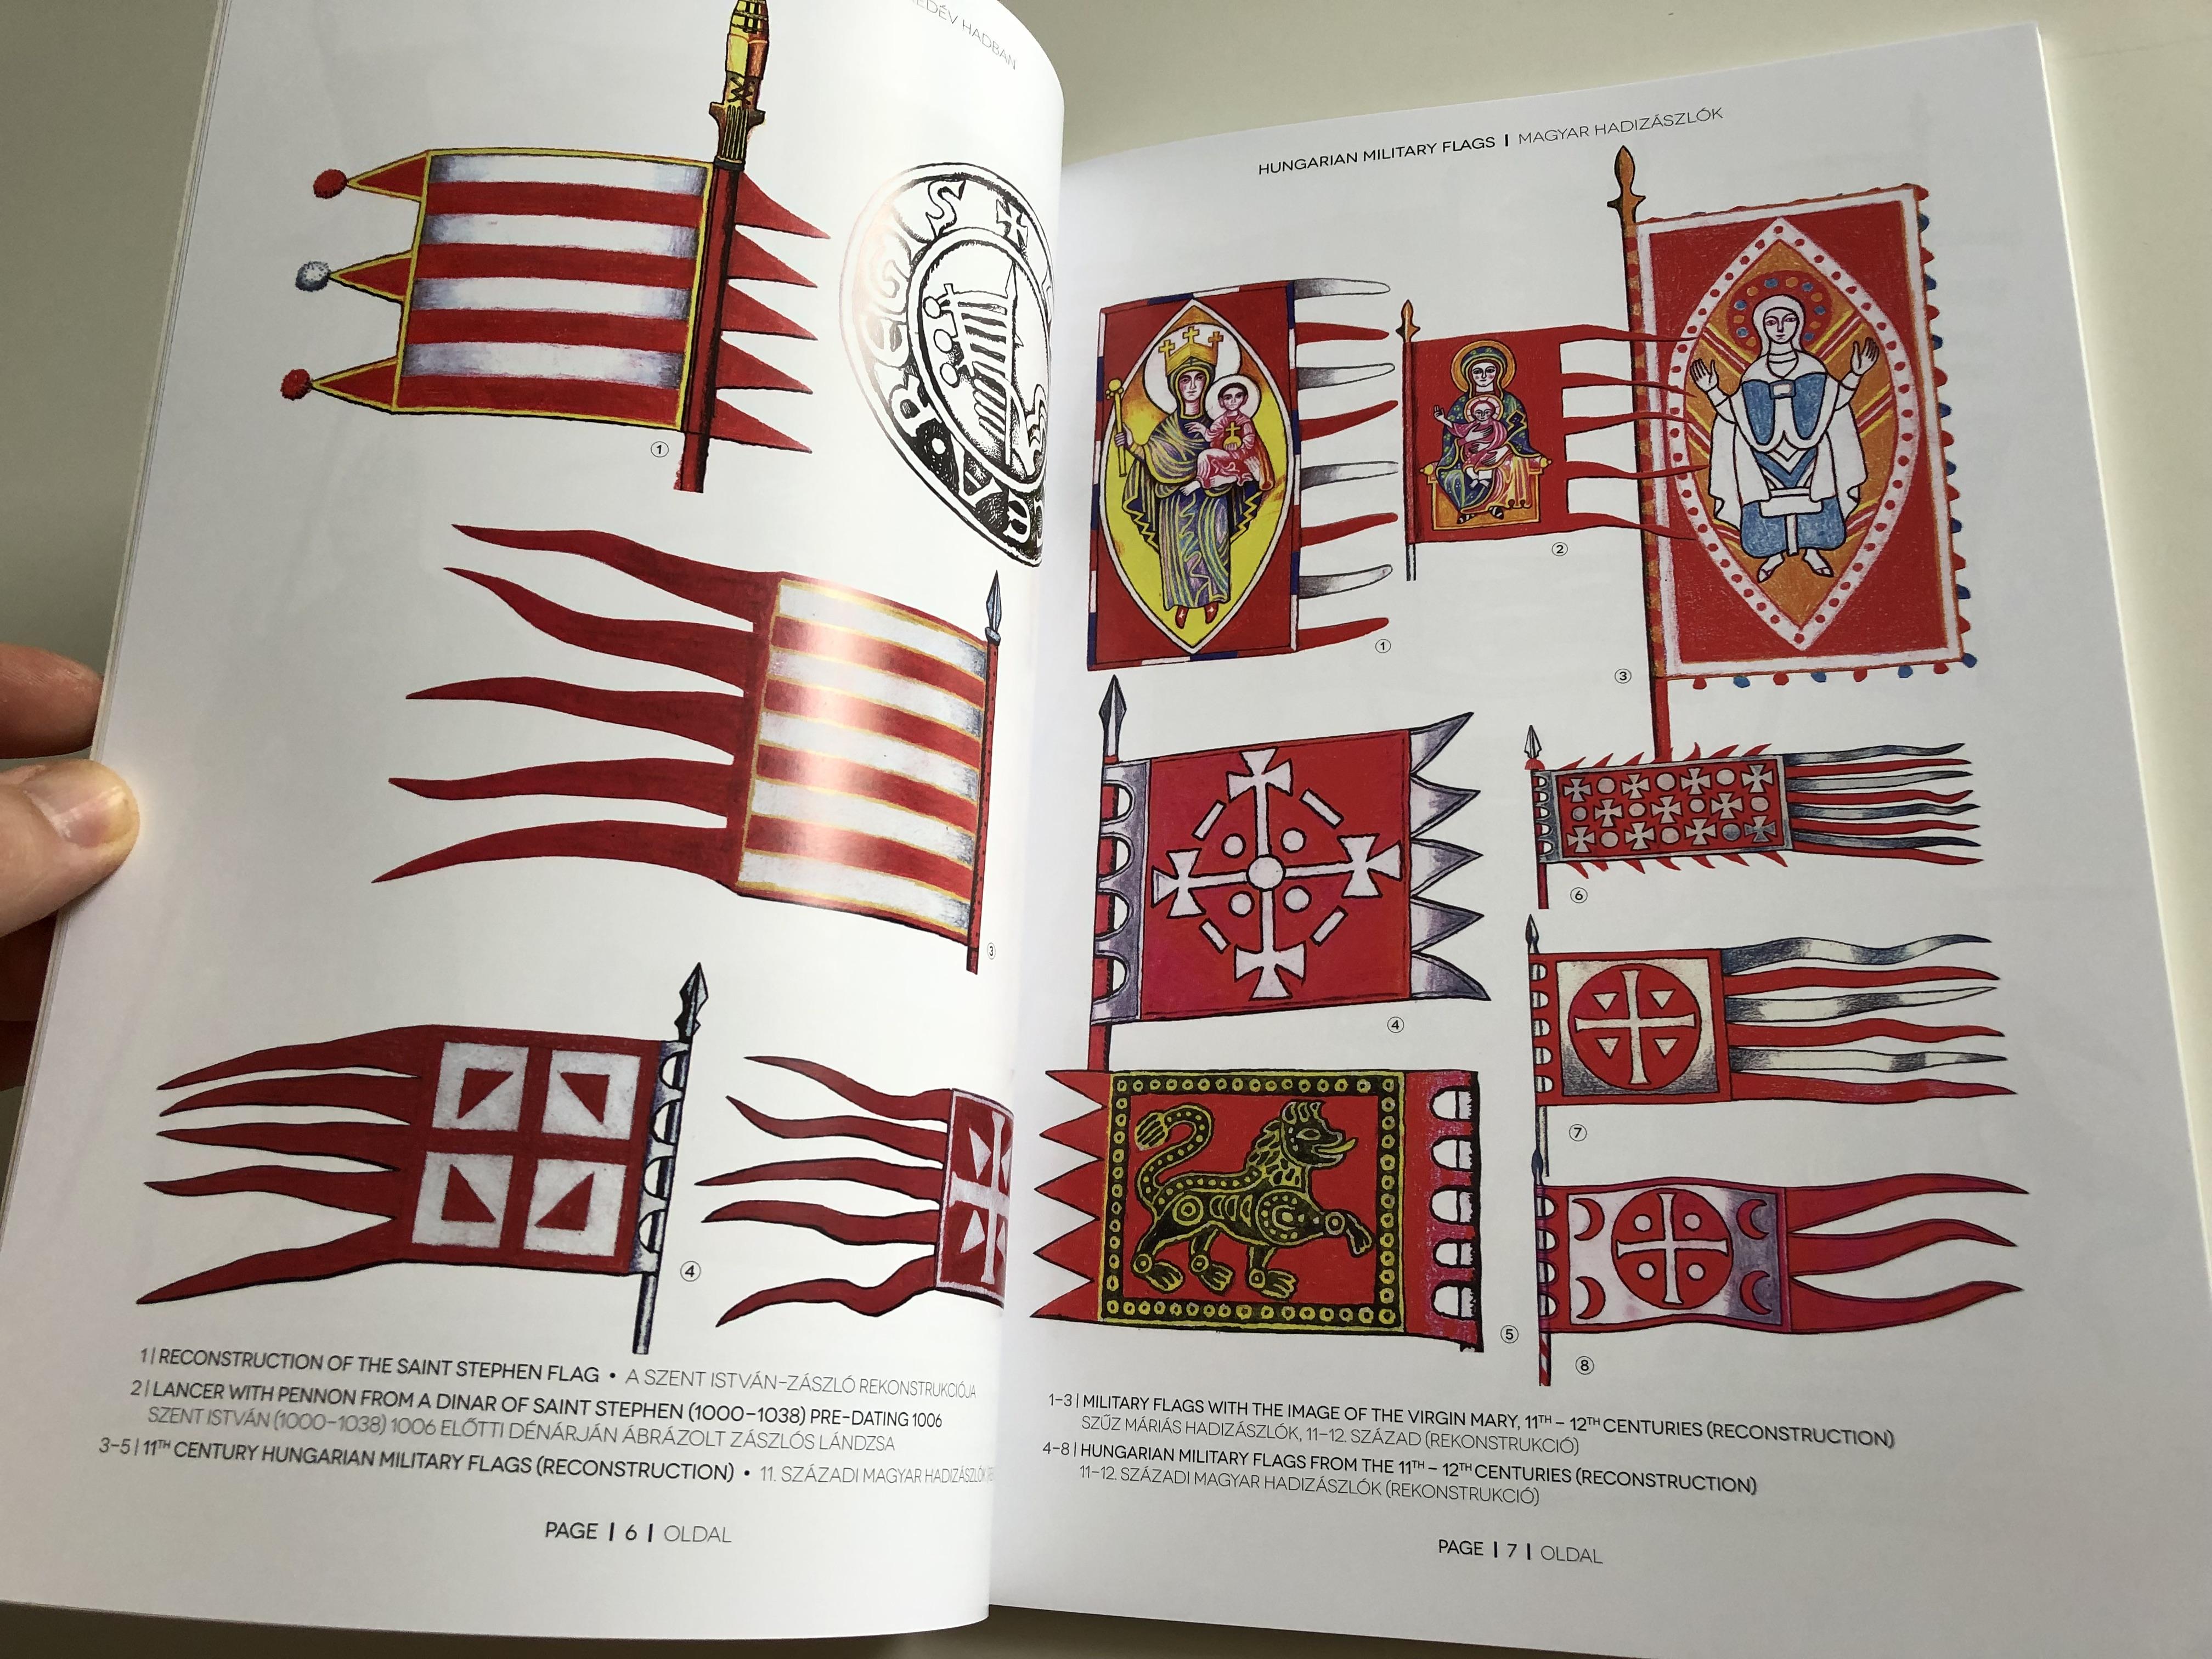 hungarian-military-flags-by-gy-z-somogyi-magyar-hadiz-szl-k-a-millennium-in-the-military-egy-ezred-v-hadban-paperback-2014-hm-zr-nyi-4-.jpg